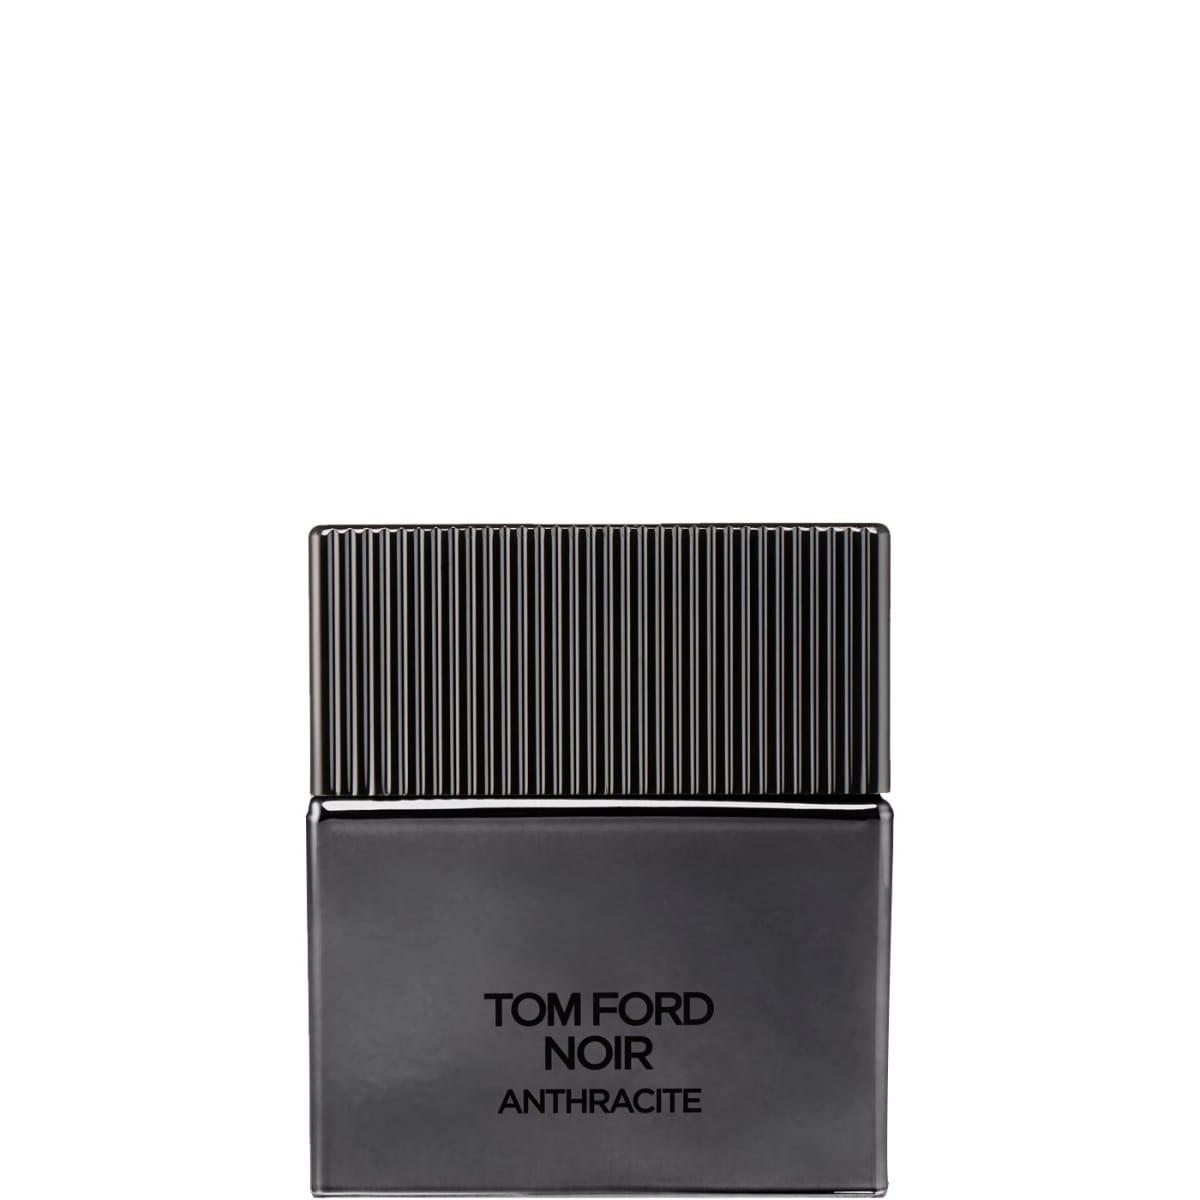 ford review perfume extreme dapper caf candy ever tom boy cafe mr o noir the